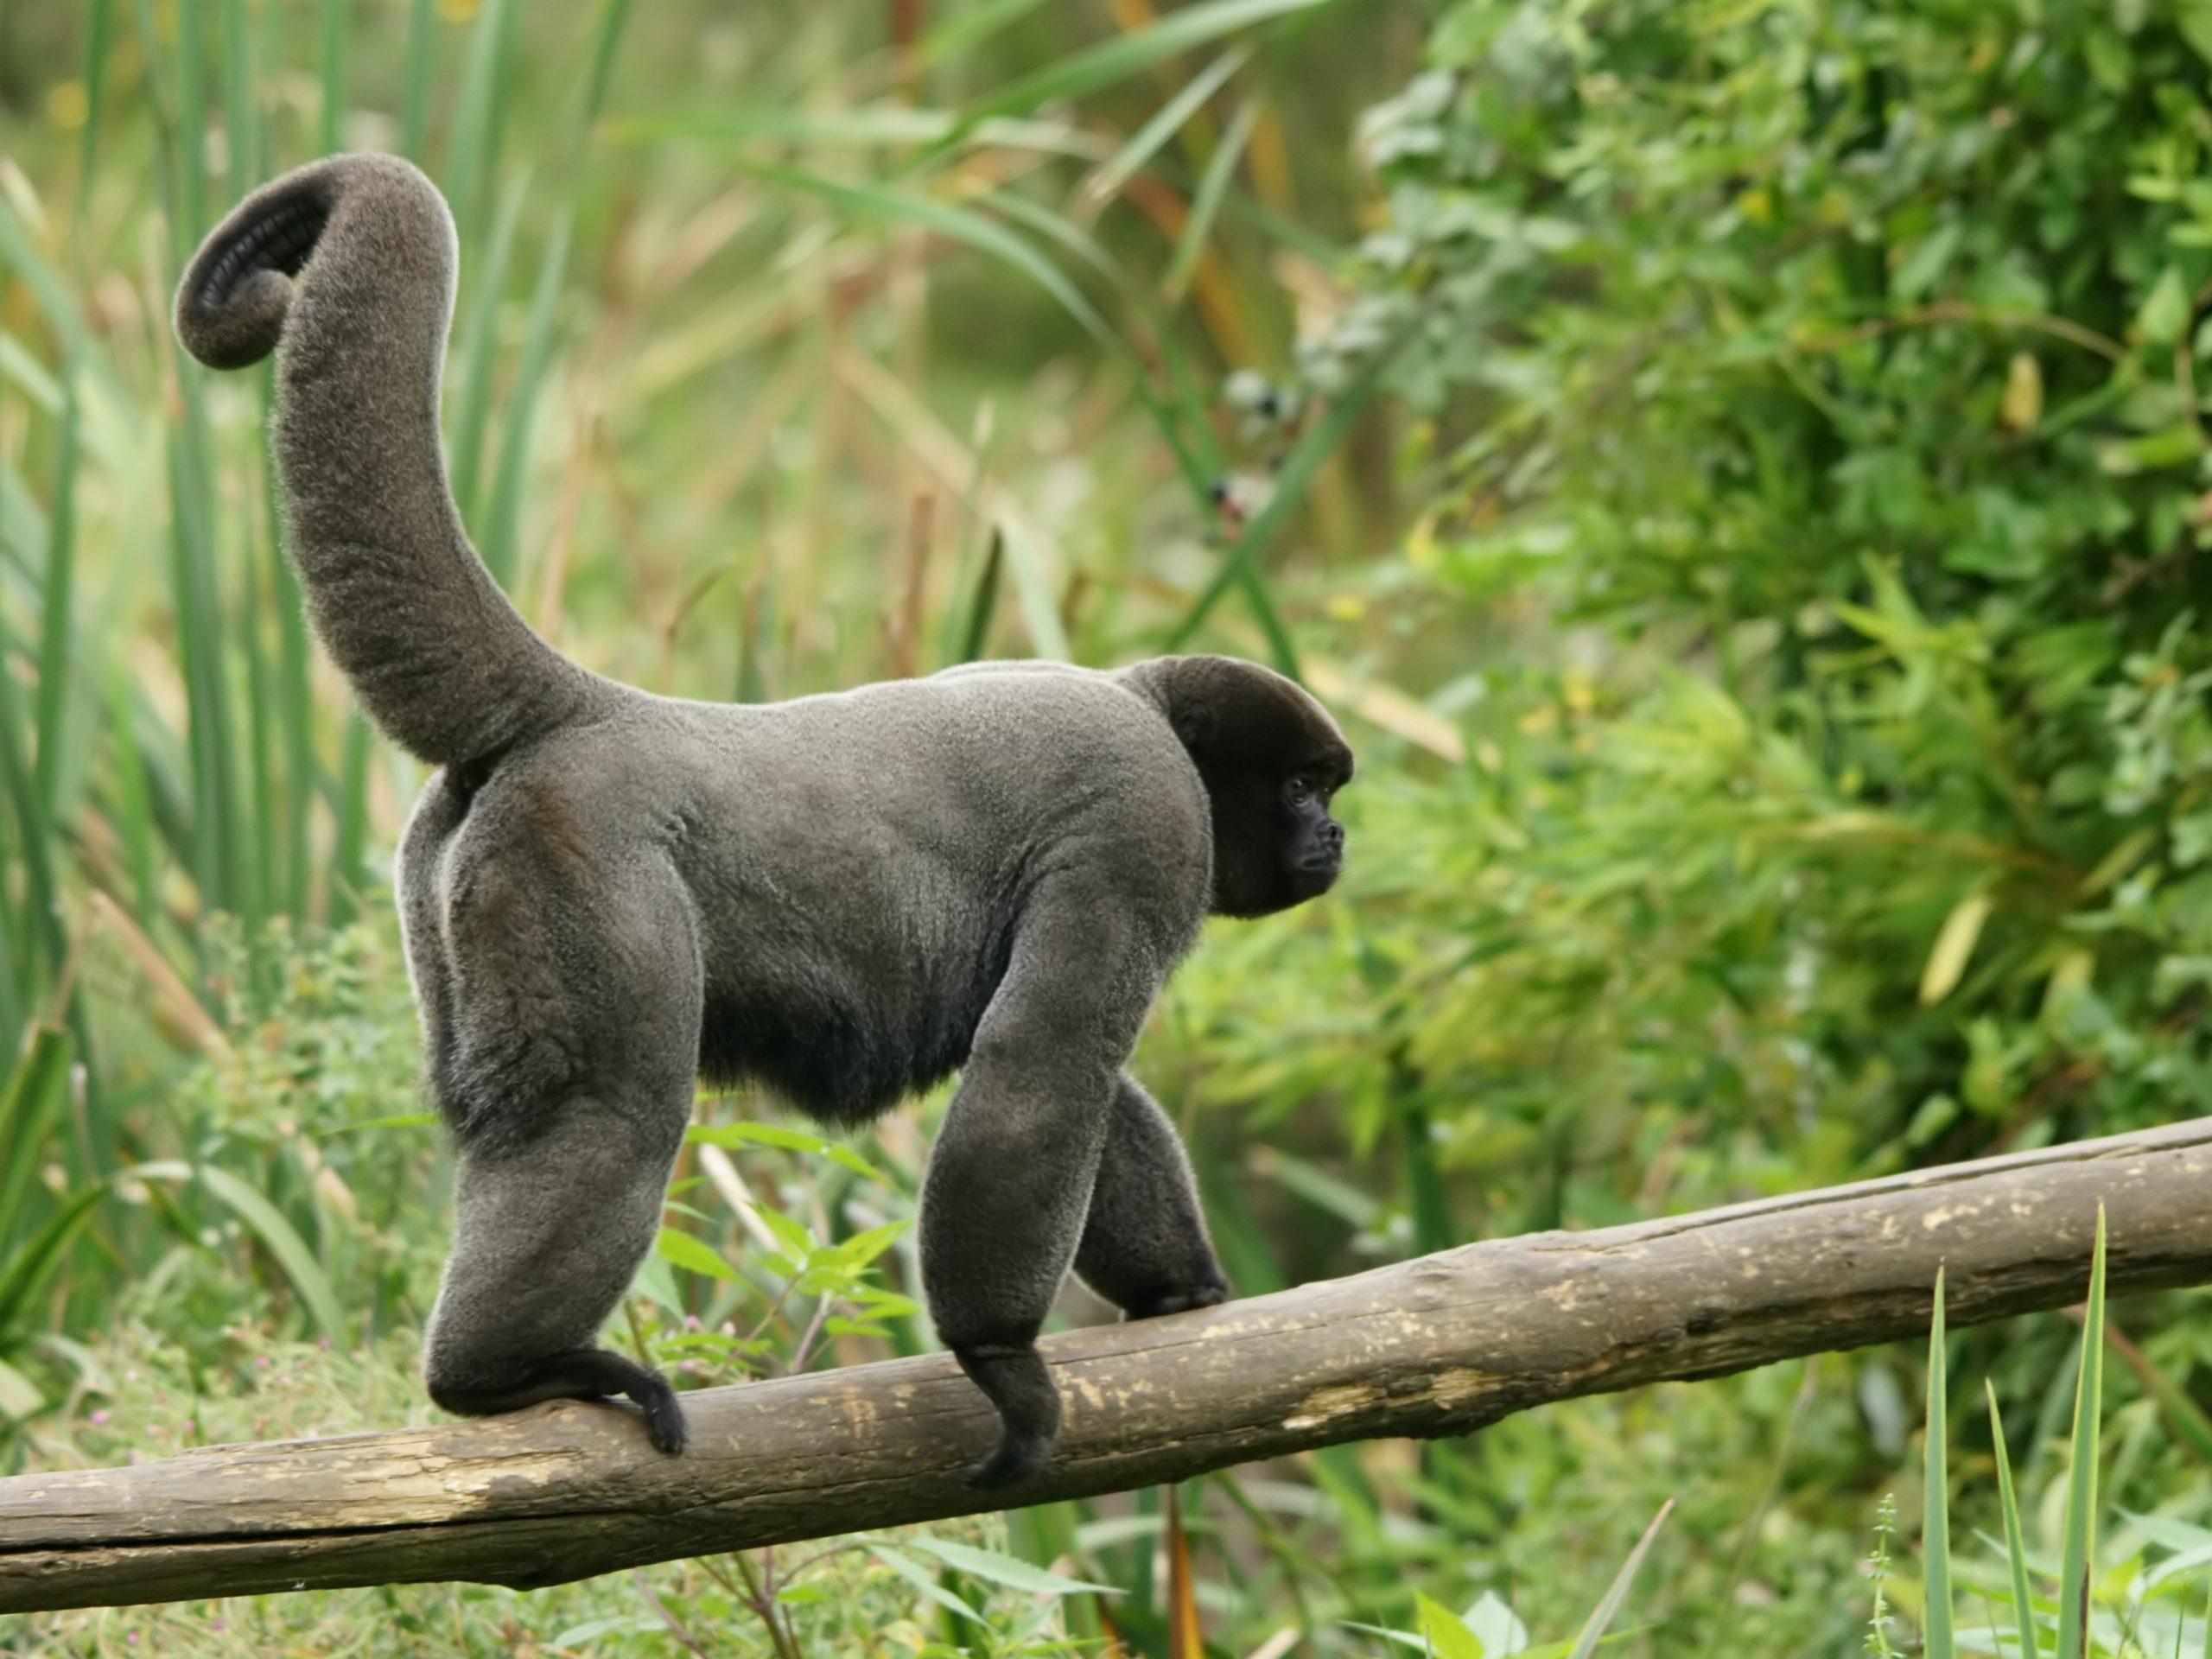 maimuta-lanoasa-cenusie-scaled.jpg